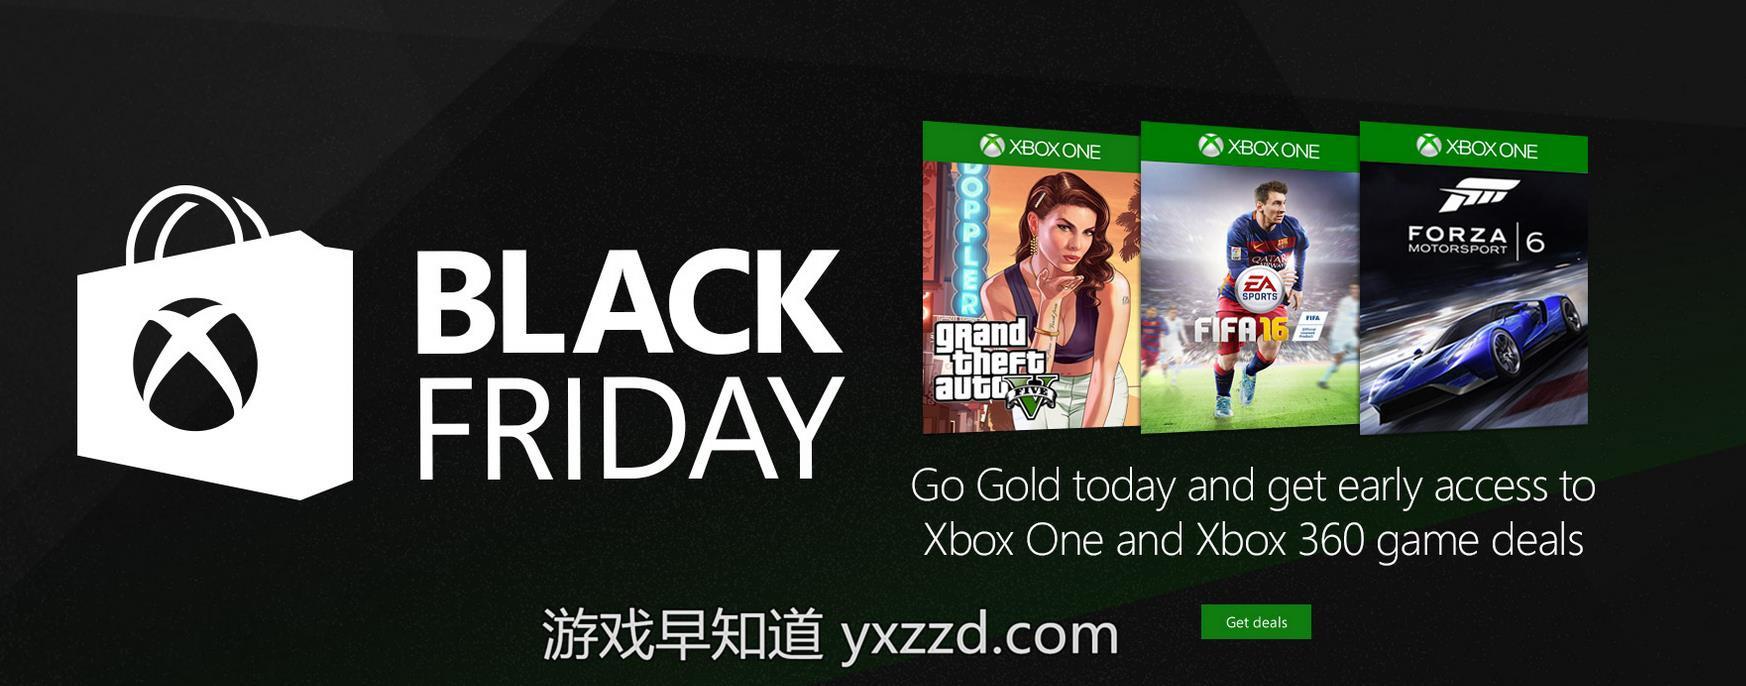 Xboxone Xbox360黑五折扣